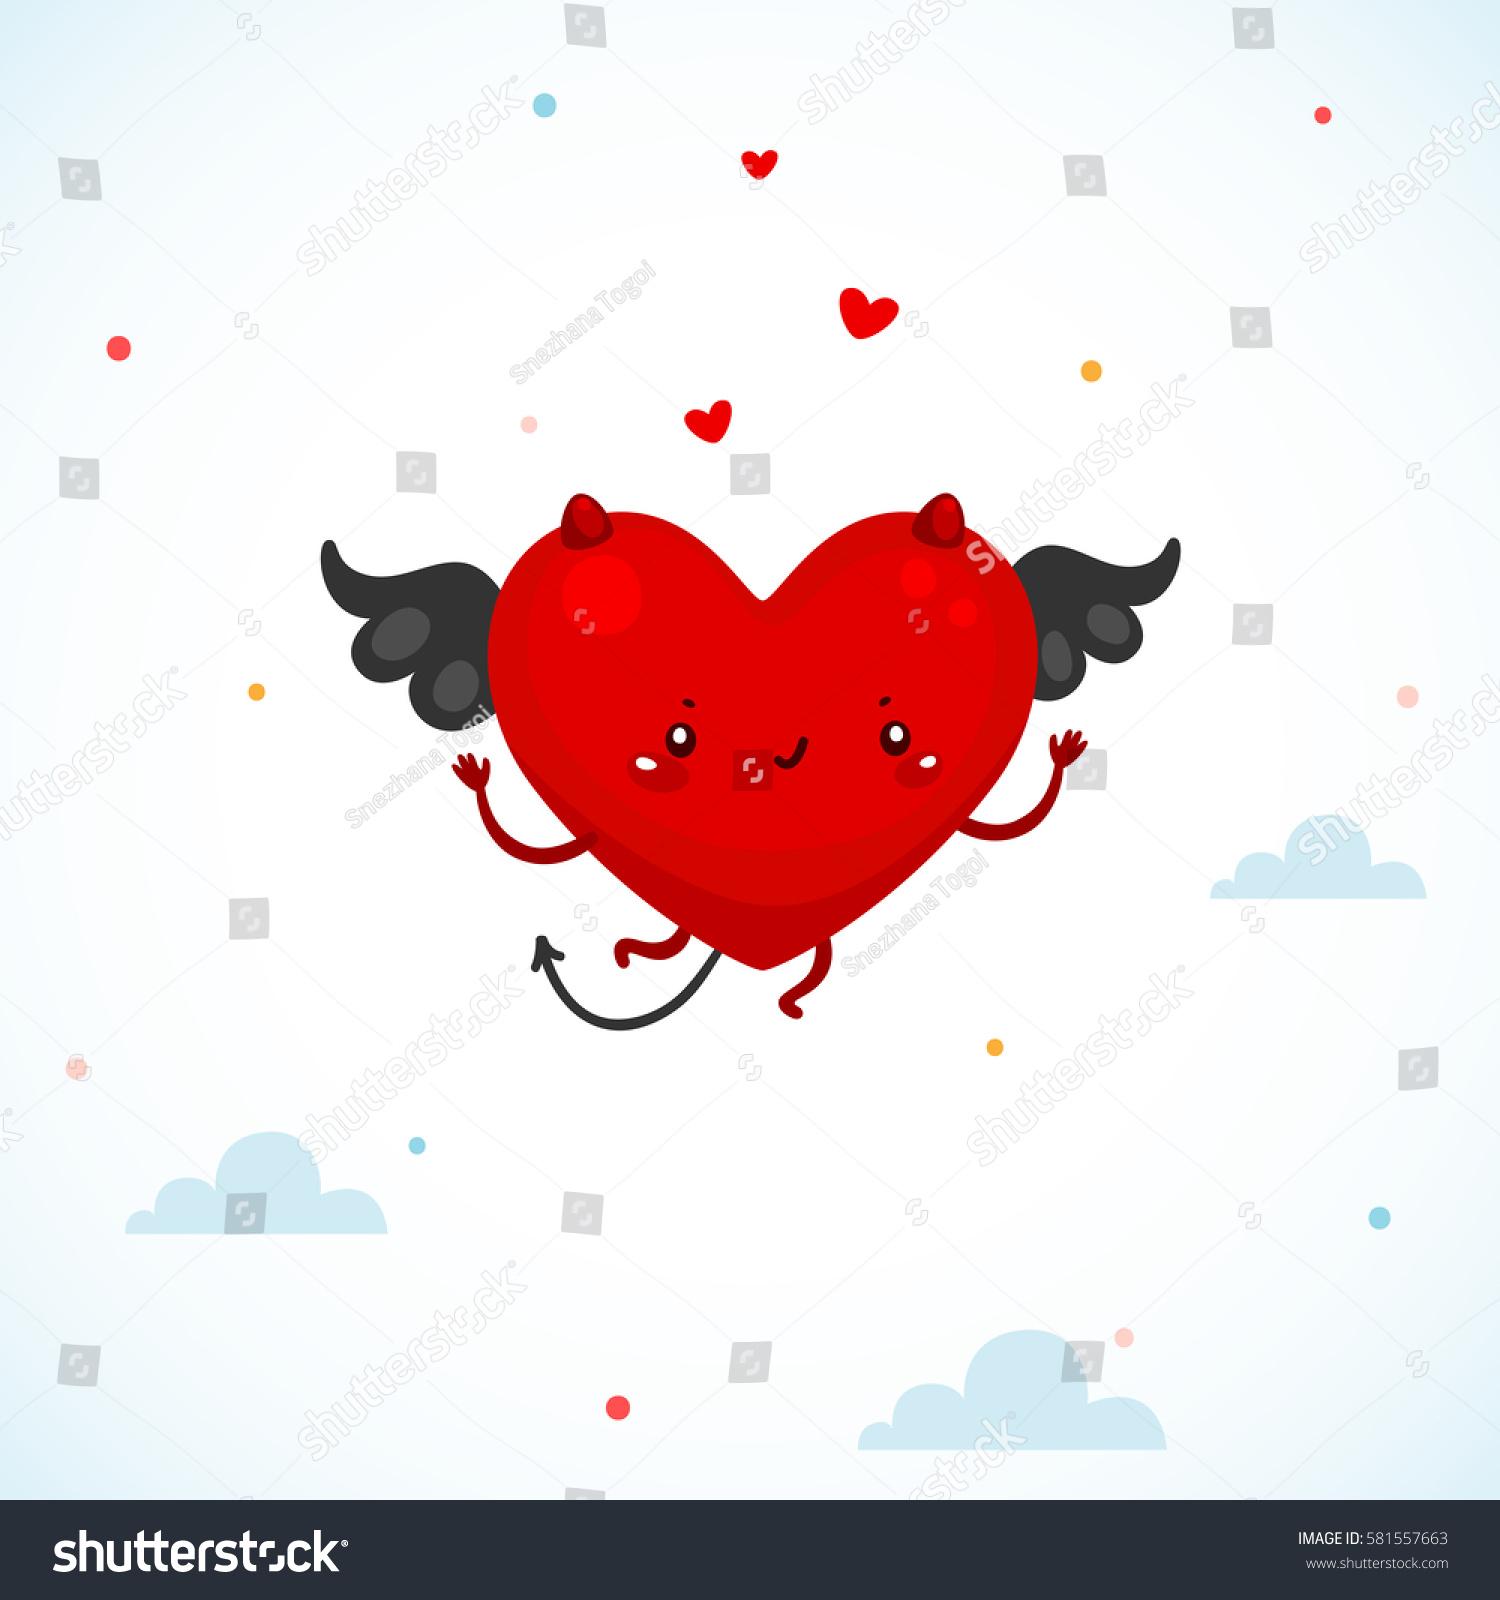 Cute devil heart symbol love cartoon stock vector 581557663 cute devil heart symbol of love cartoon character buycottarizona Images